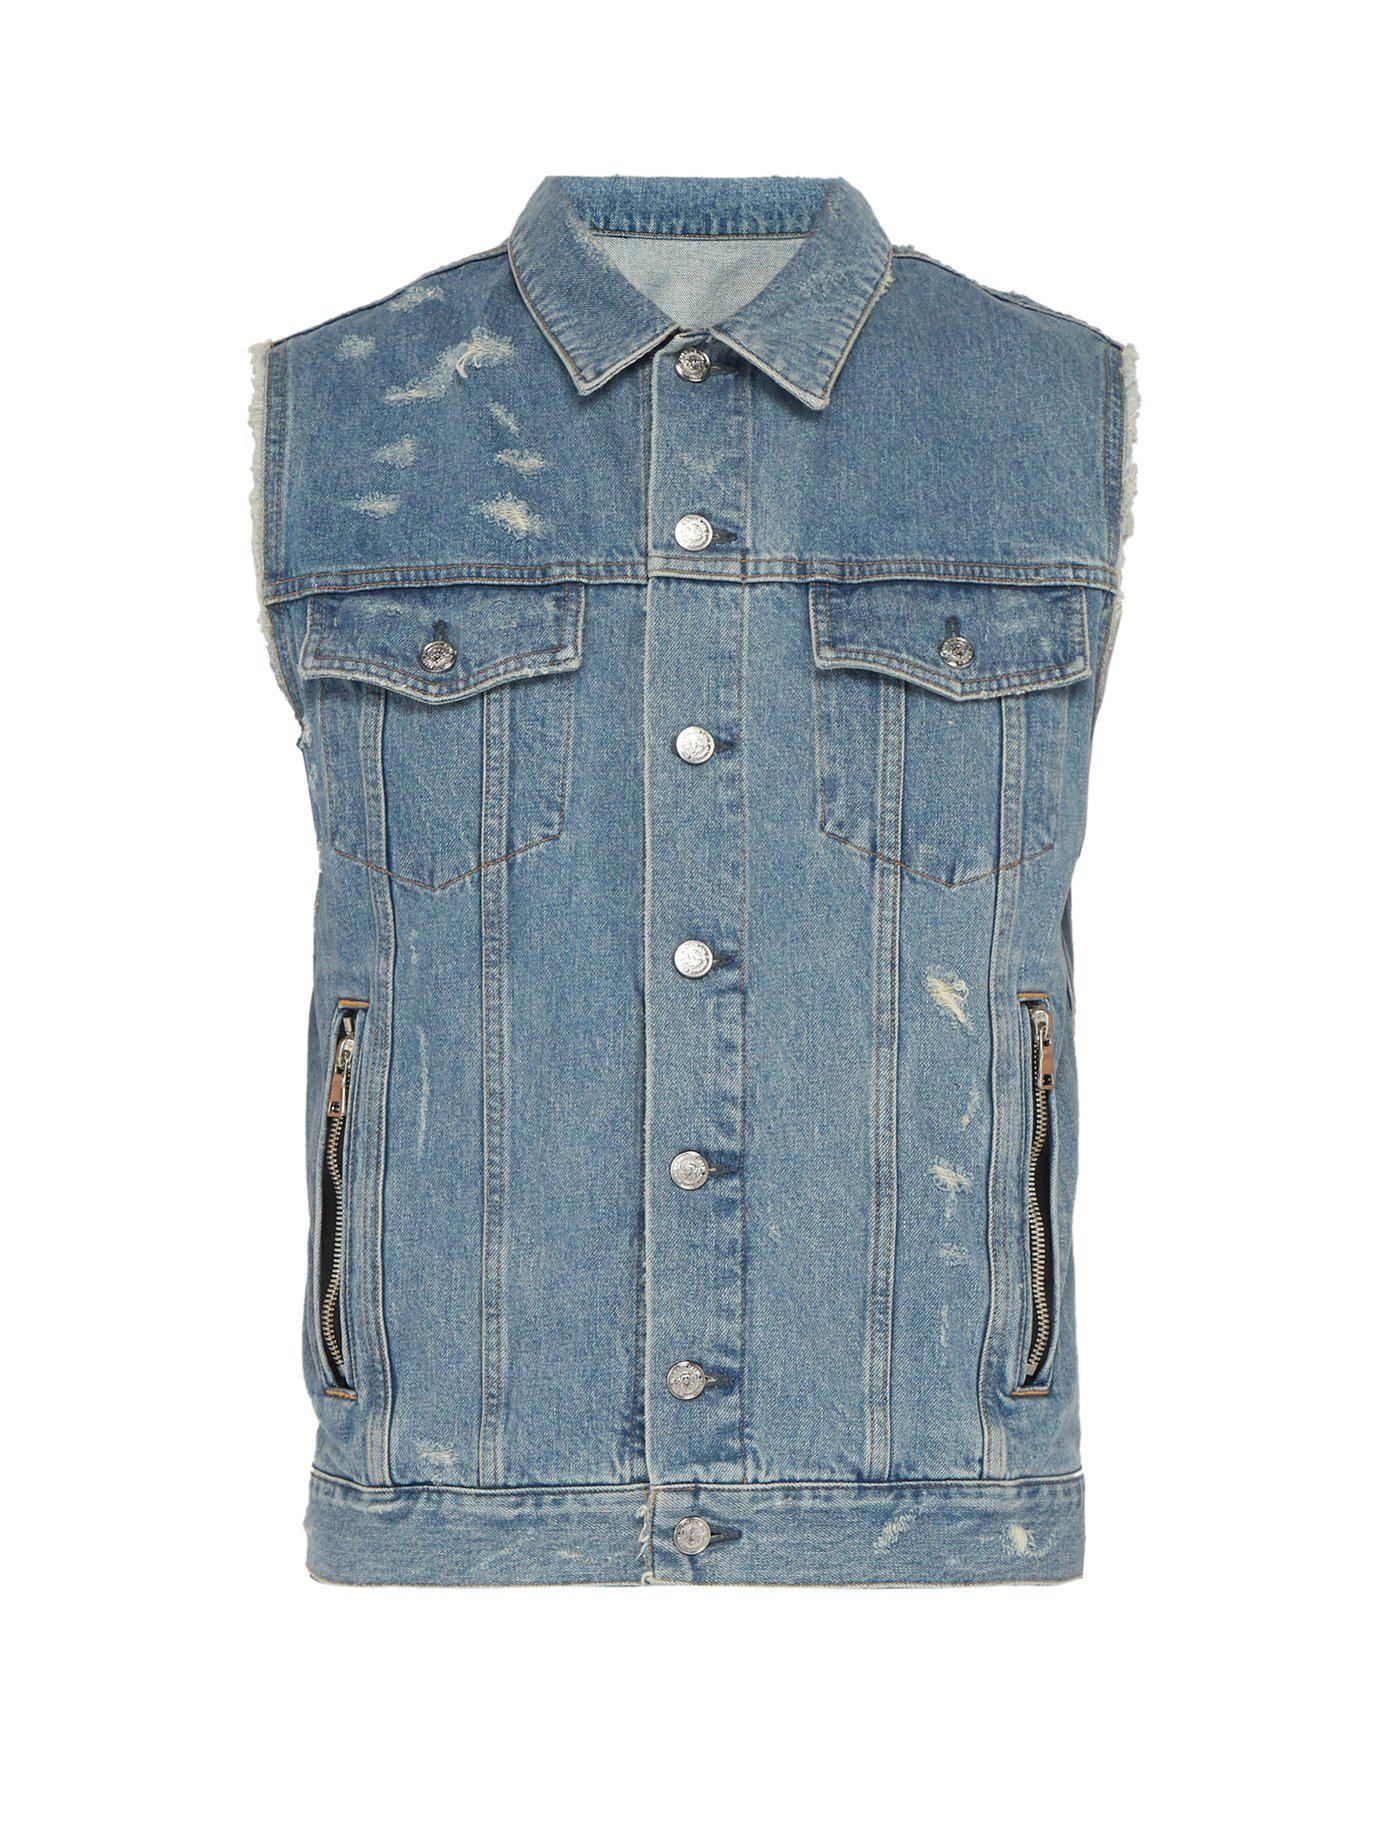 970e34dfa4fbf3 Lyst - Balmain Distressed Sleeveless Denim Jacket in Blue for Men